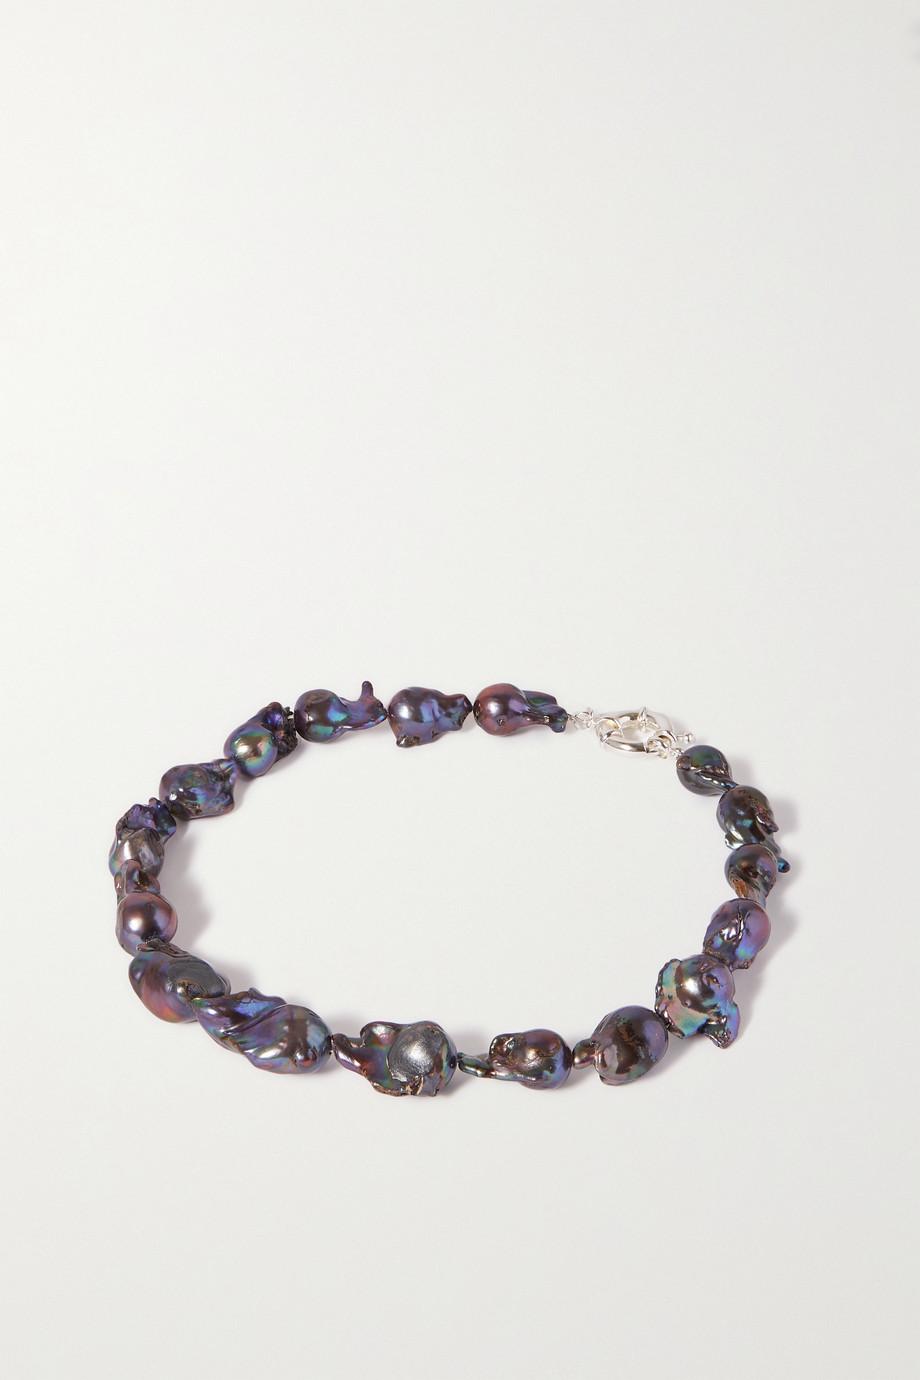 PEARL OCTOPUSS.Y Perlenkette mit versilberten Details